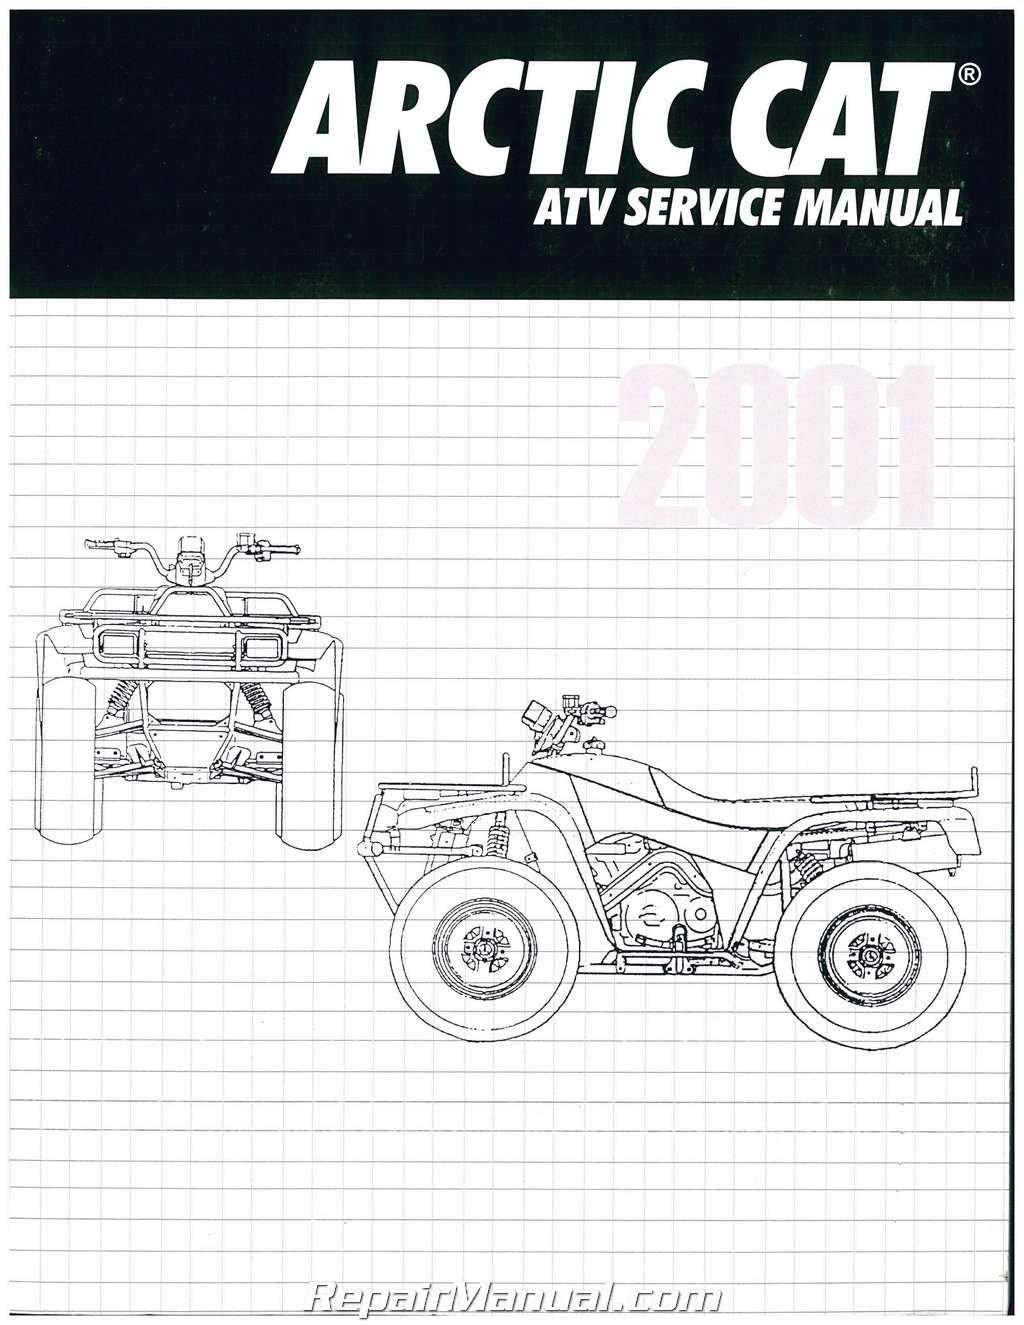 2256-348 2001 Arctic Cat 250 300 400 500 ATV Service Manual ... on